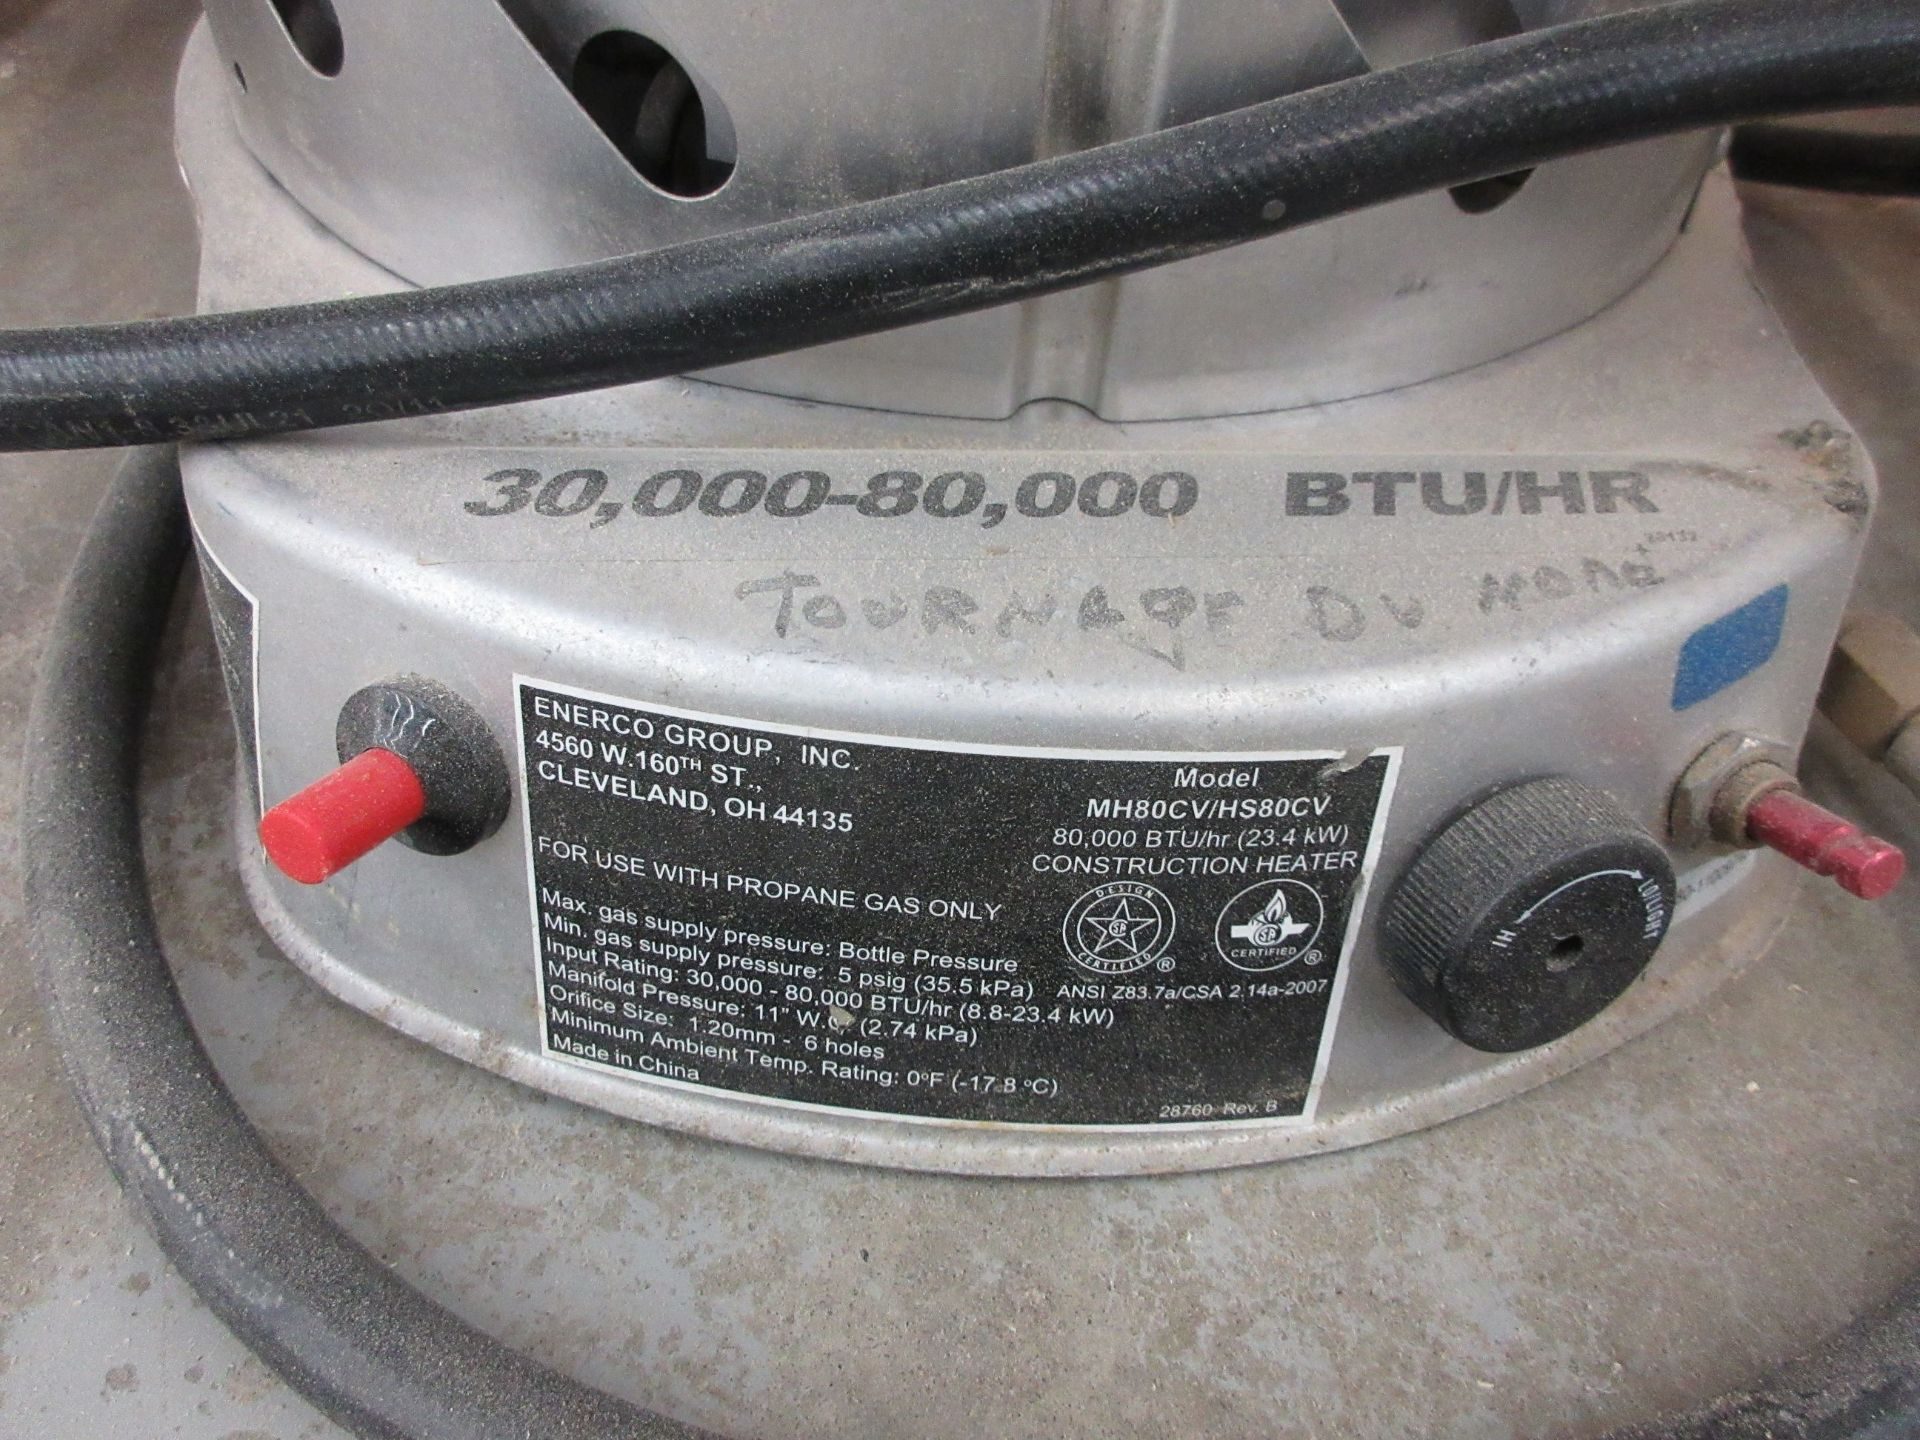 Lot 57 - Propane heater 30,000 to 80,000 BTU